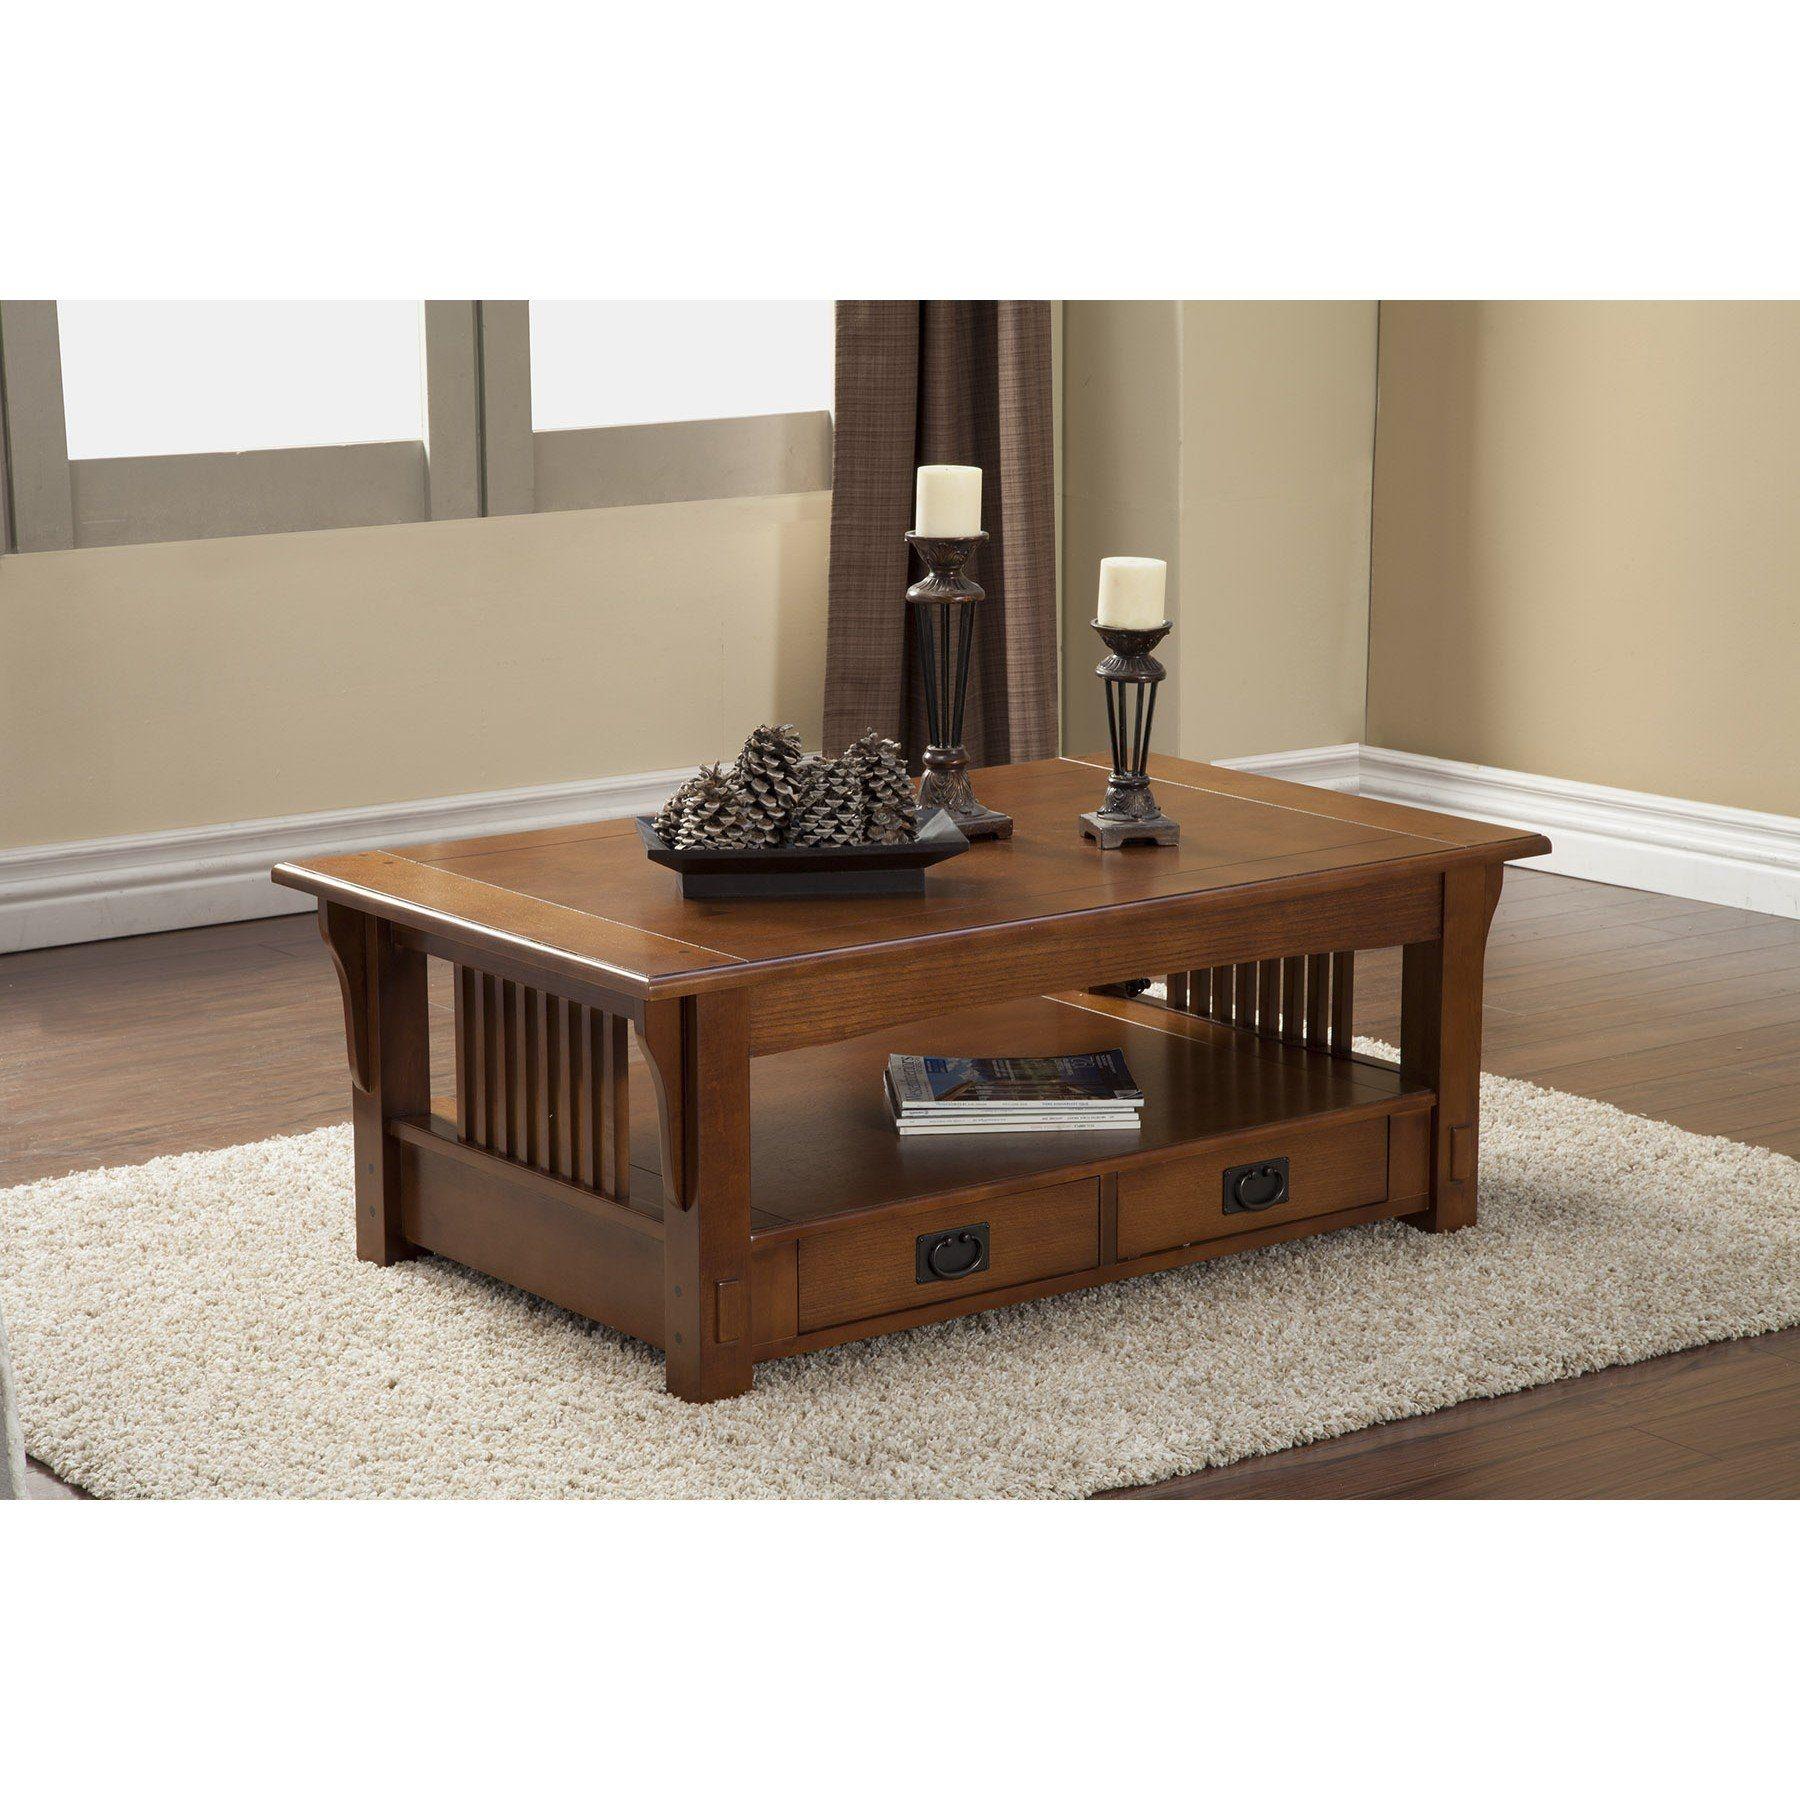 oak round coffee table ideas on foter